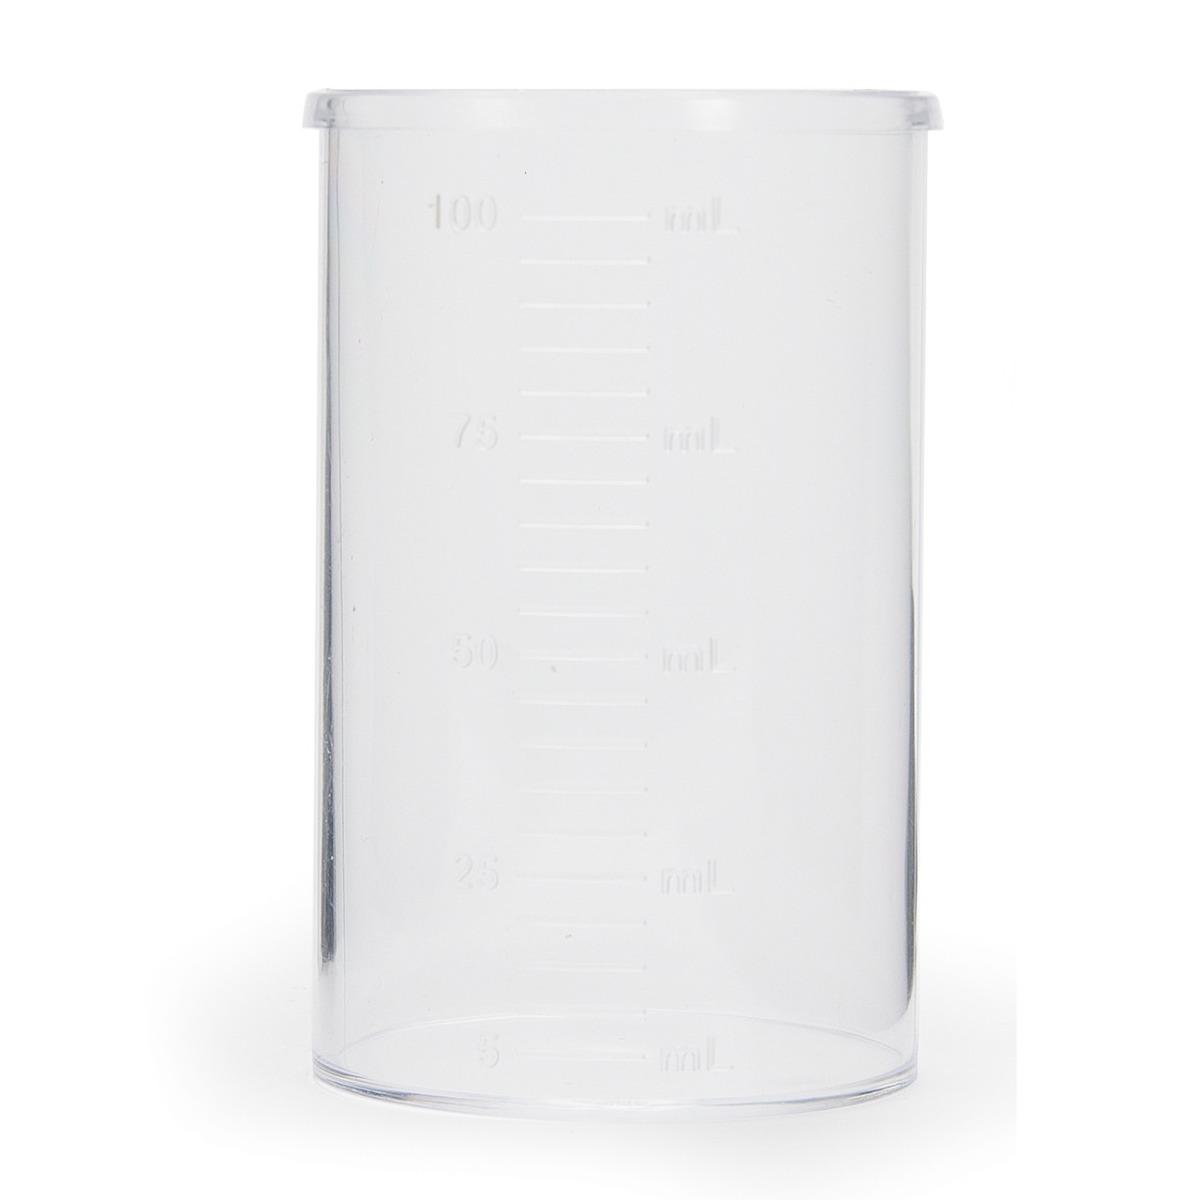 Set de Vasos de Plástico, 20 mL (10) - HI740037P